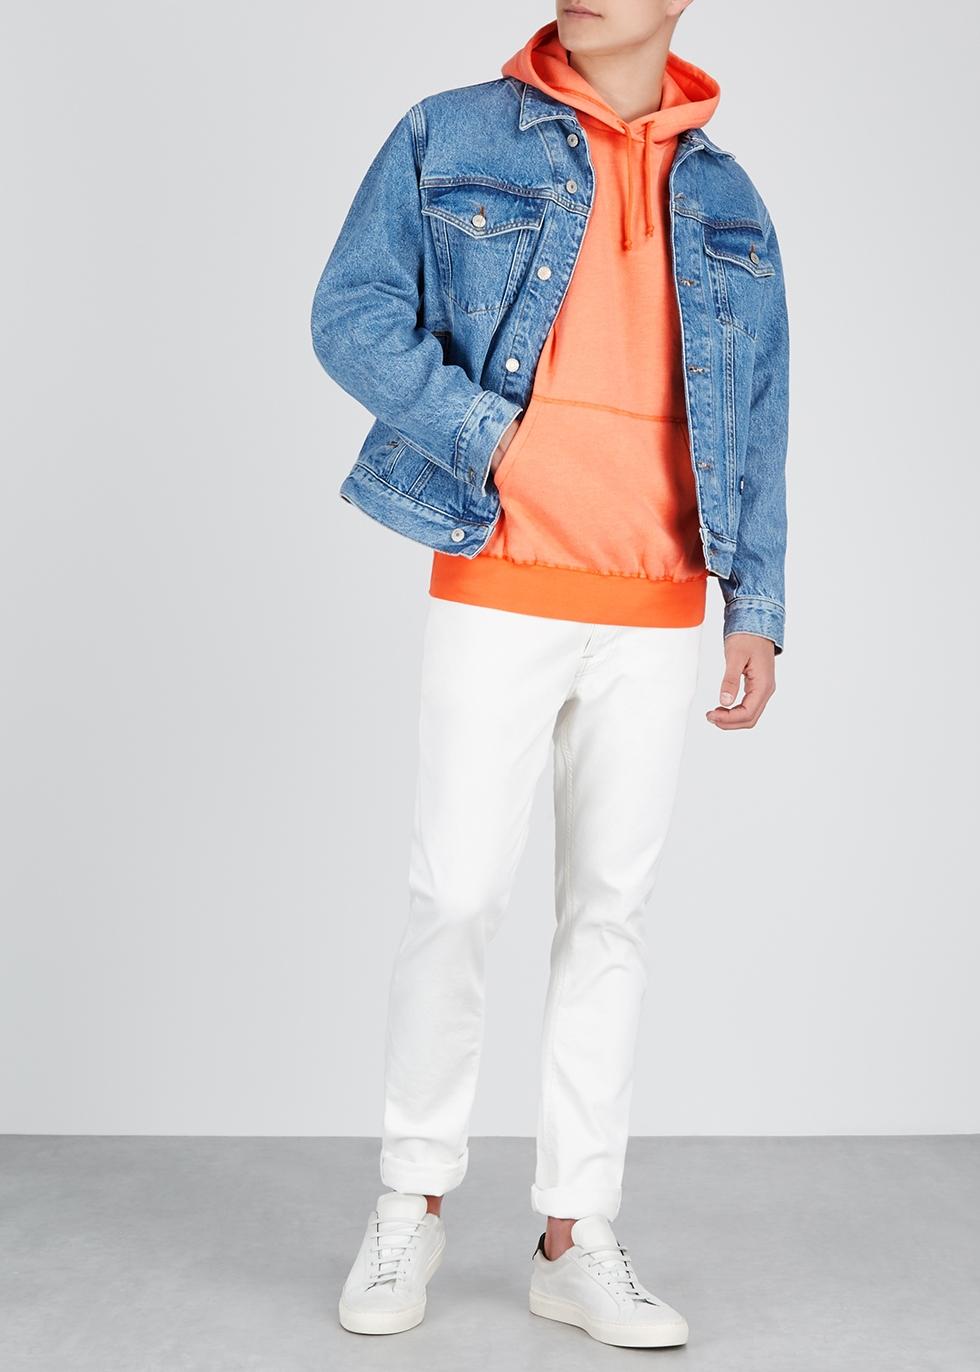 9316eb0bcc Men's Designer Clothing and Fashion - Harvey Nichols